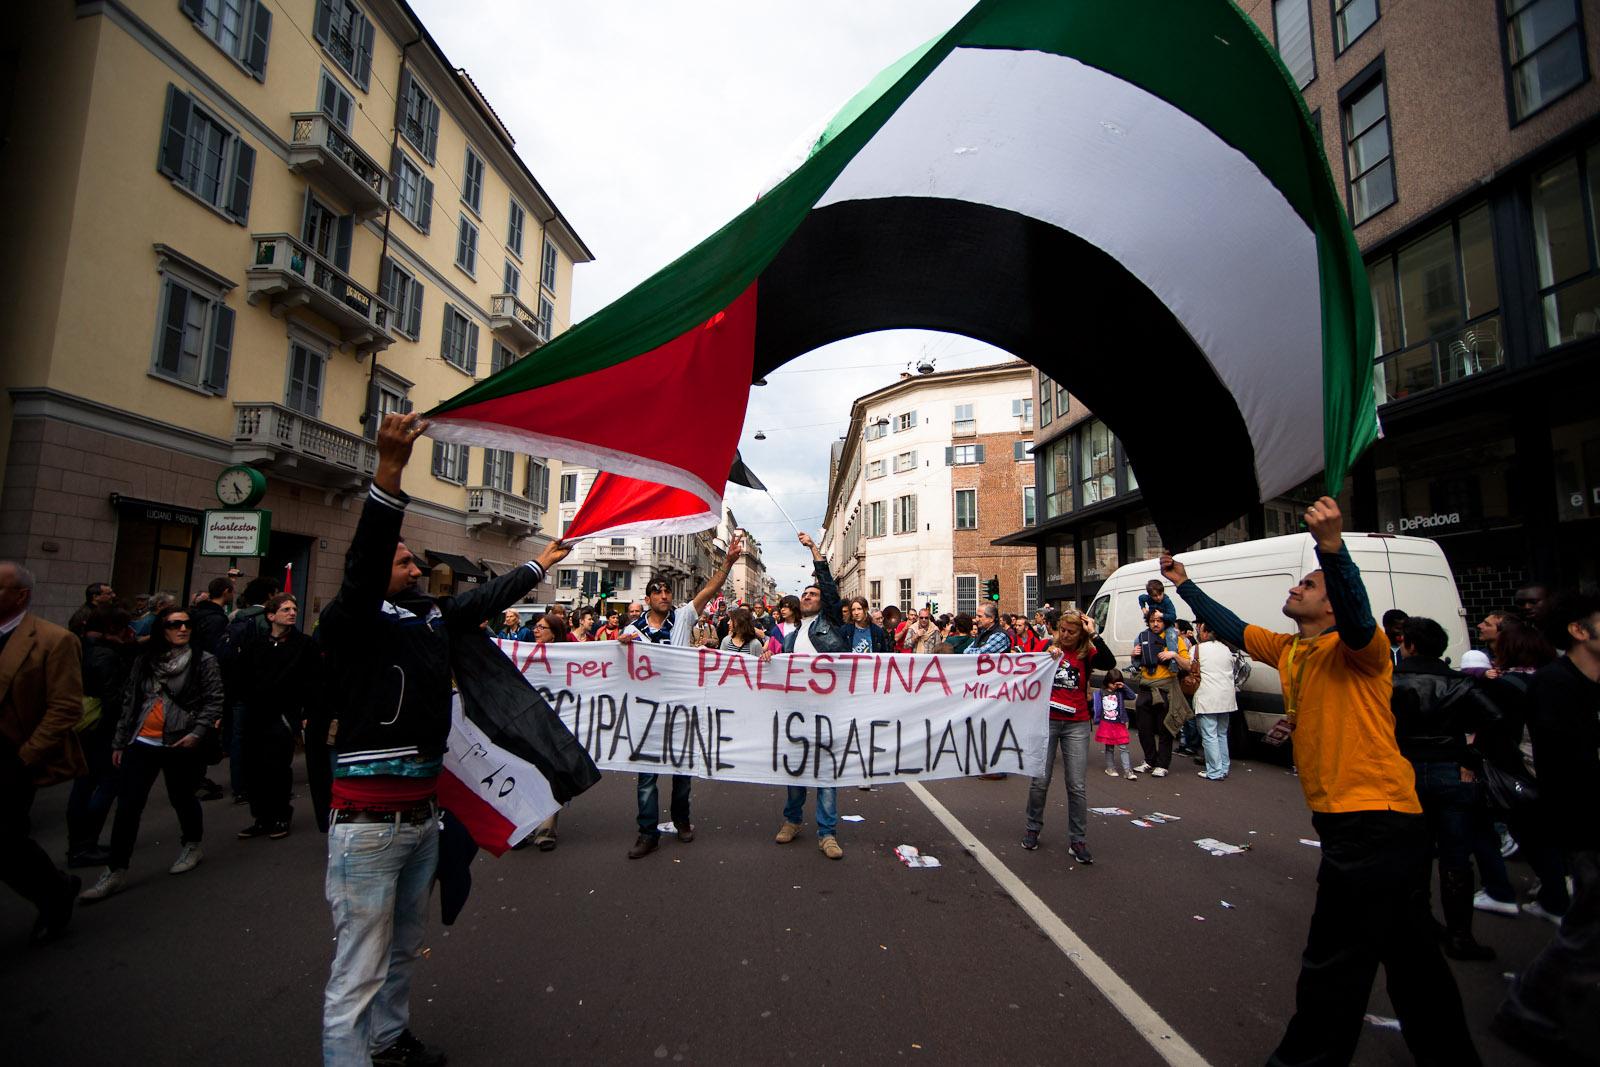 24 - Free Palestine